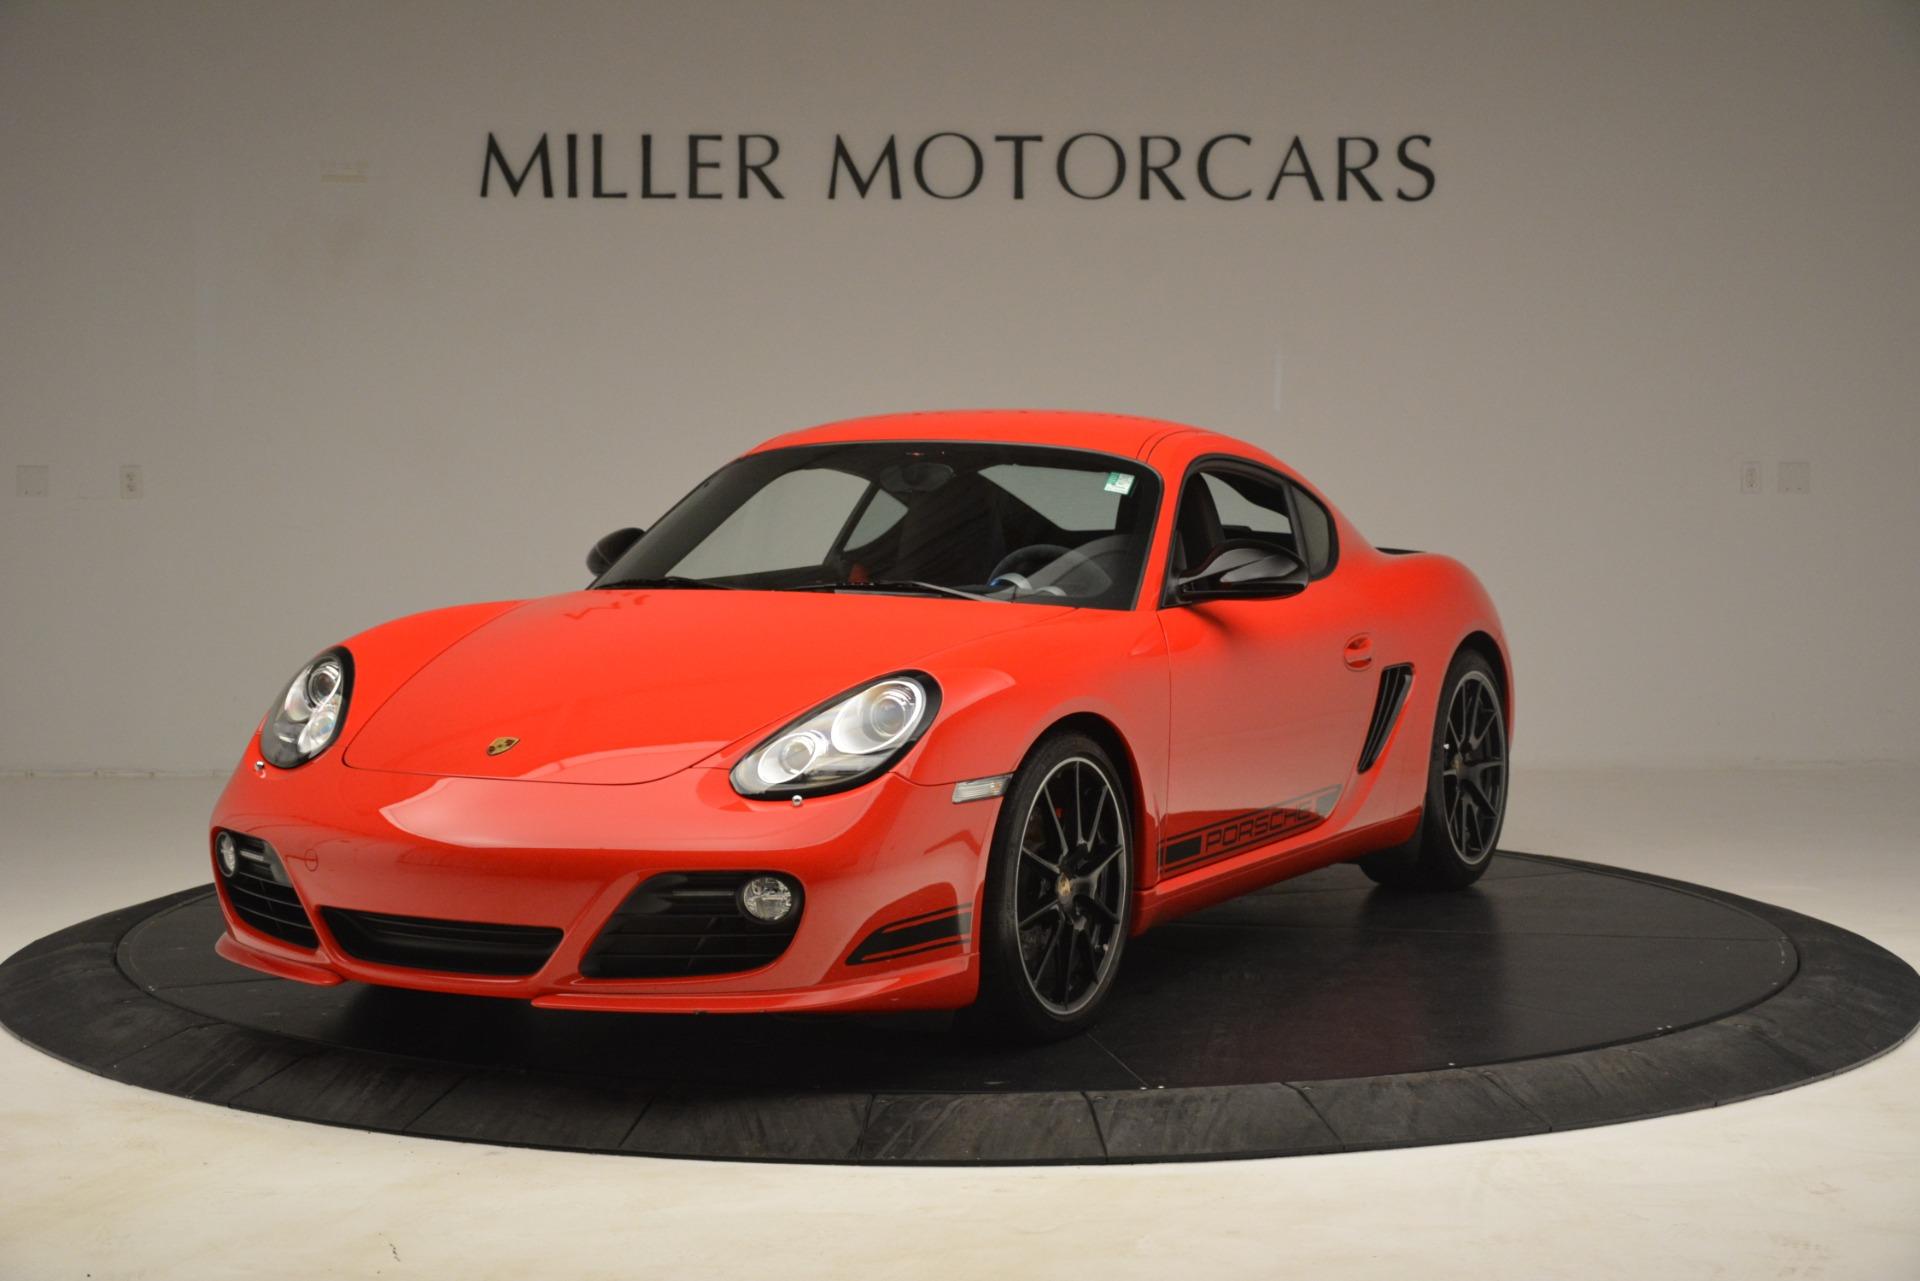 Used 2012 Porsche Cayman R for sale Sold at Alfa Romeo of Westport in Westport CT 06880 1